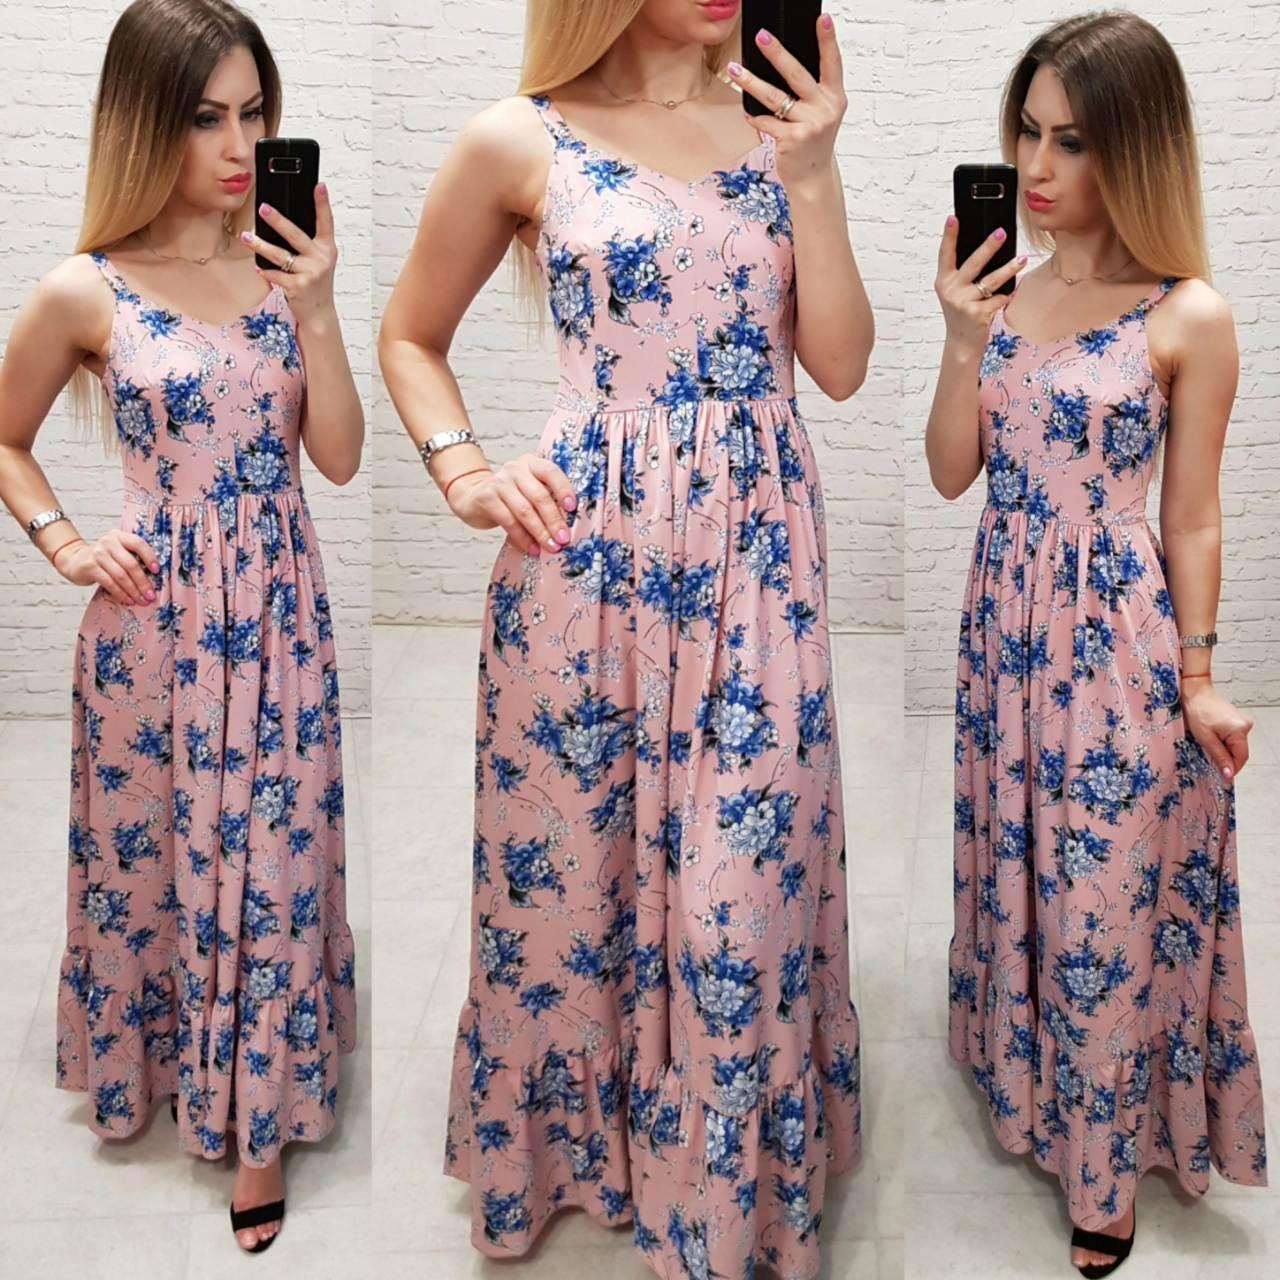 Сукня арт 162 рожеве у блакитний букетик